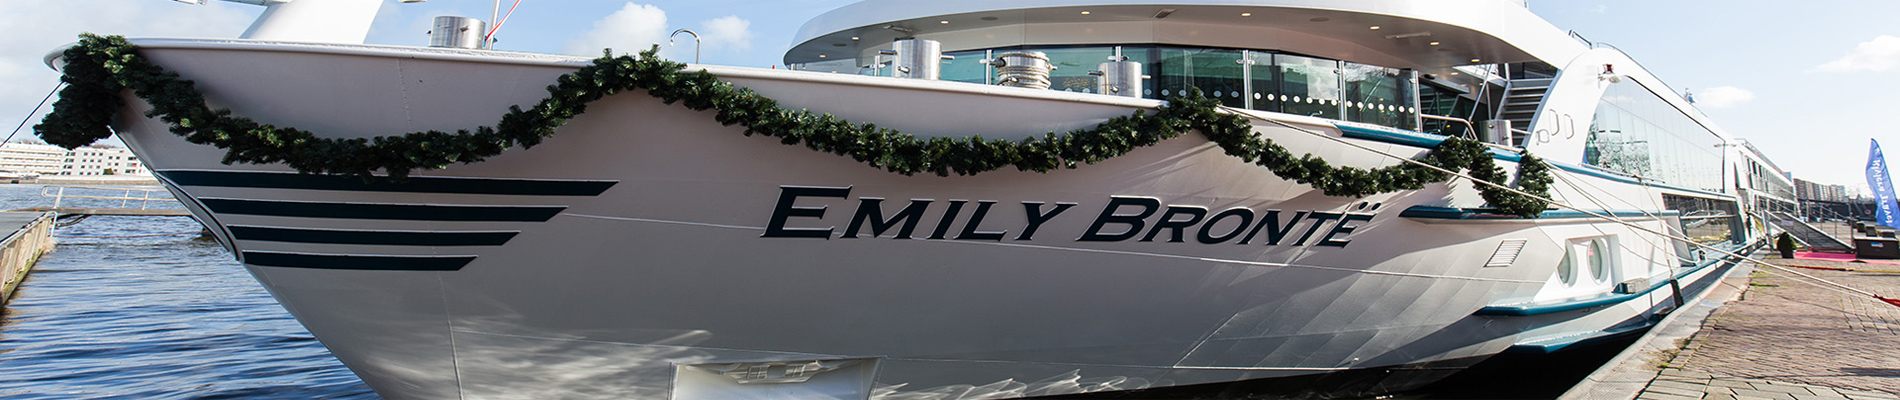 MS Emily Bronte